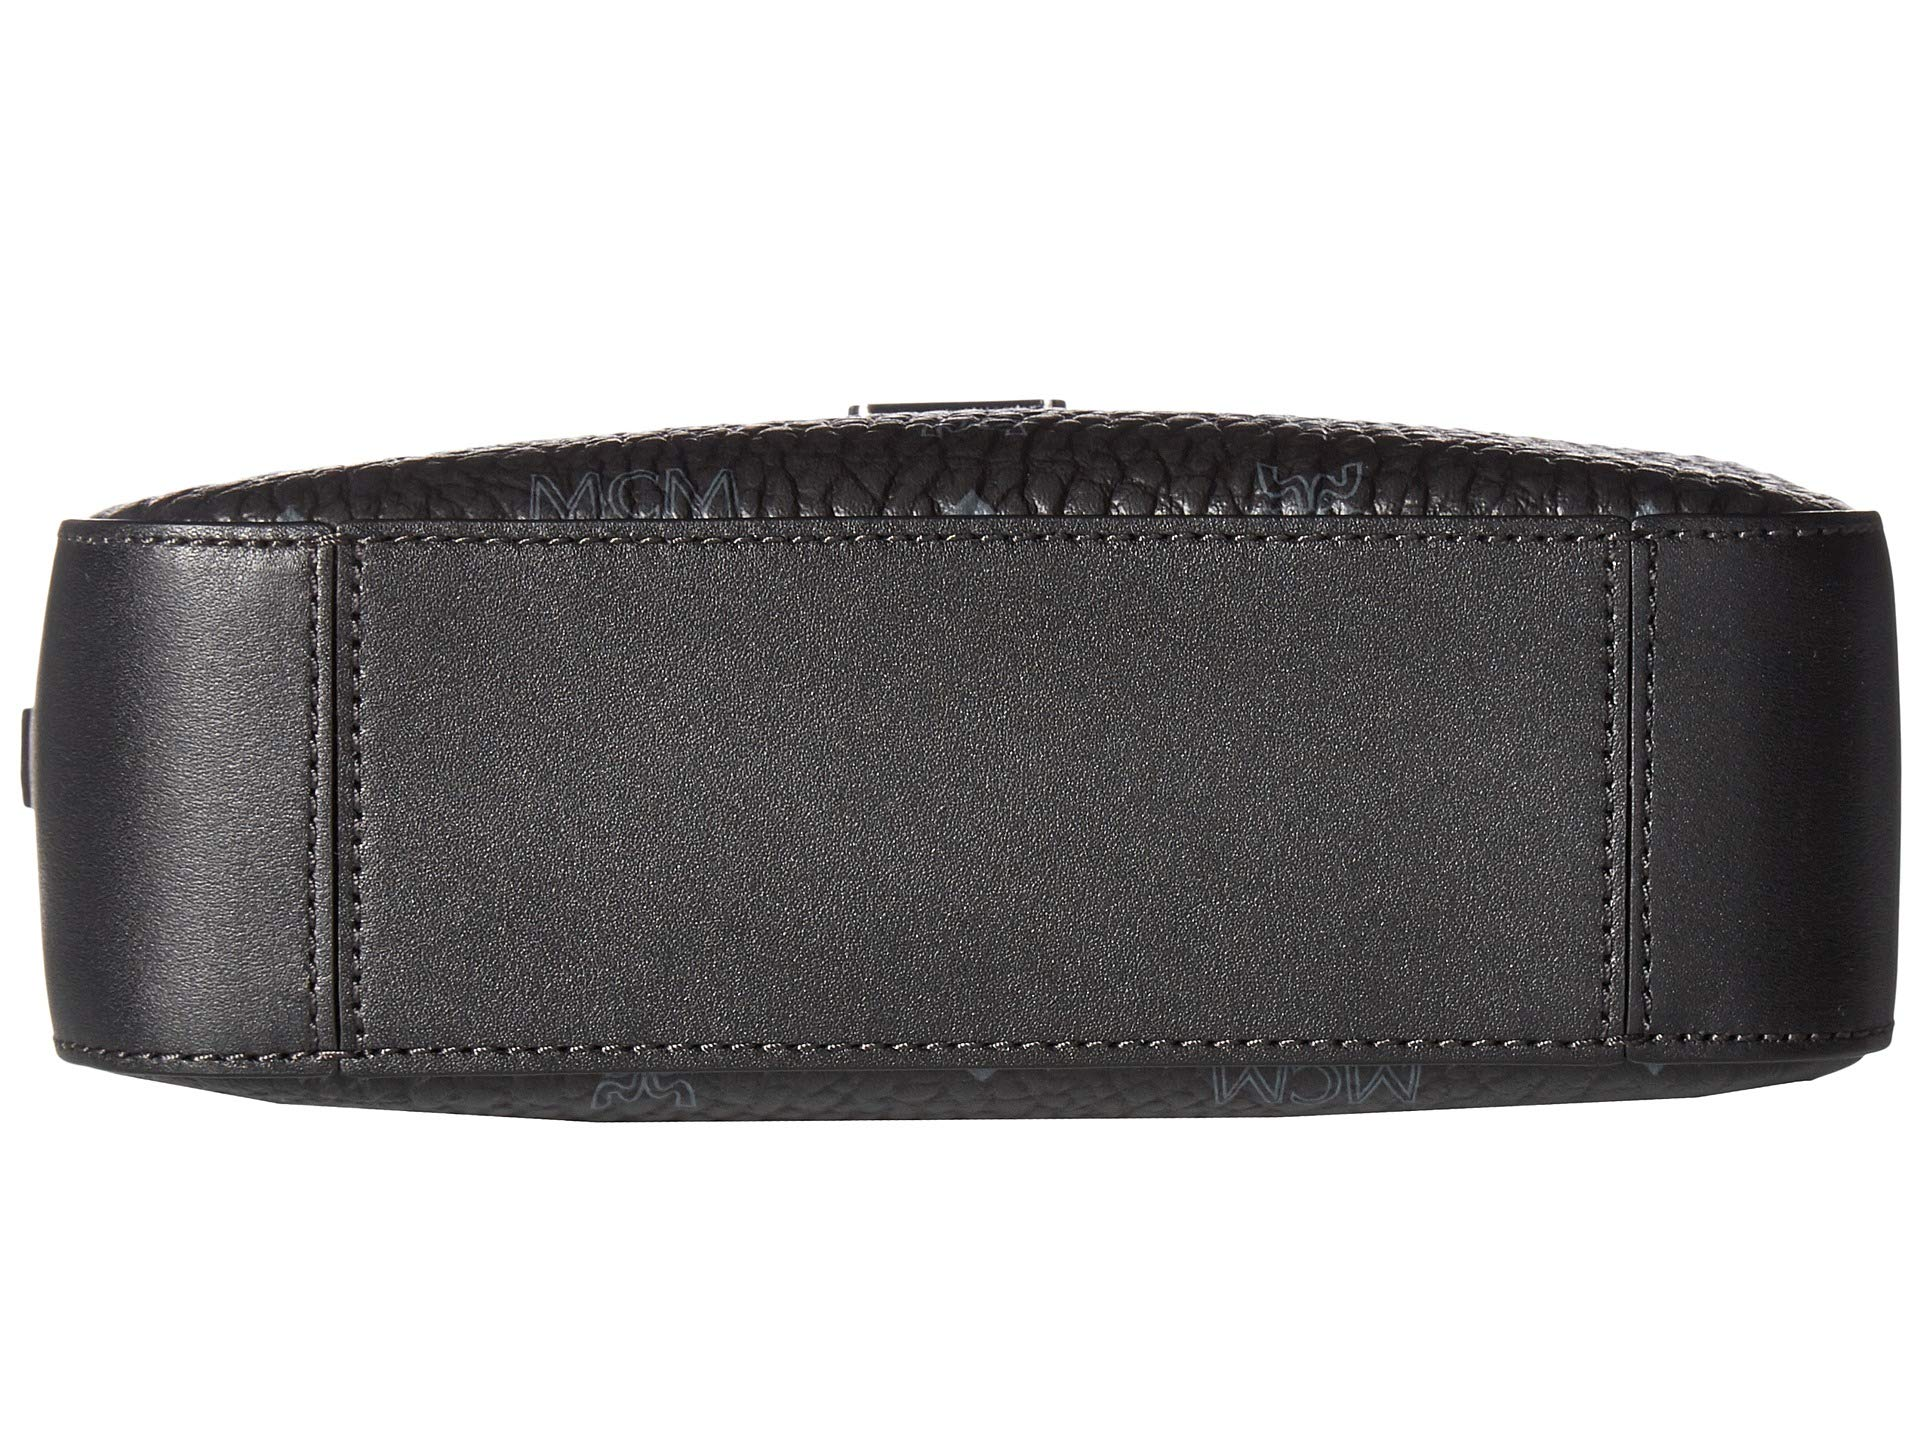 Leather Others Small Original Mcm Goods Black Visetos qzRUzwf